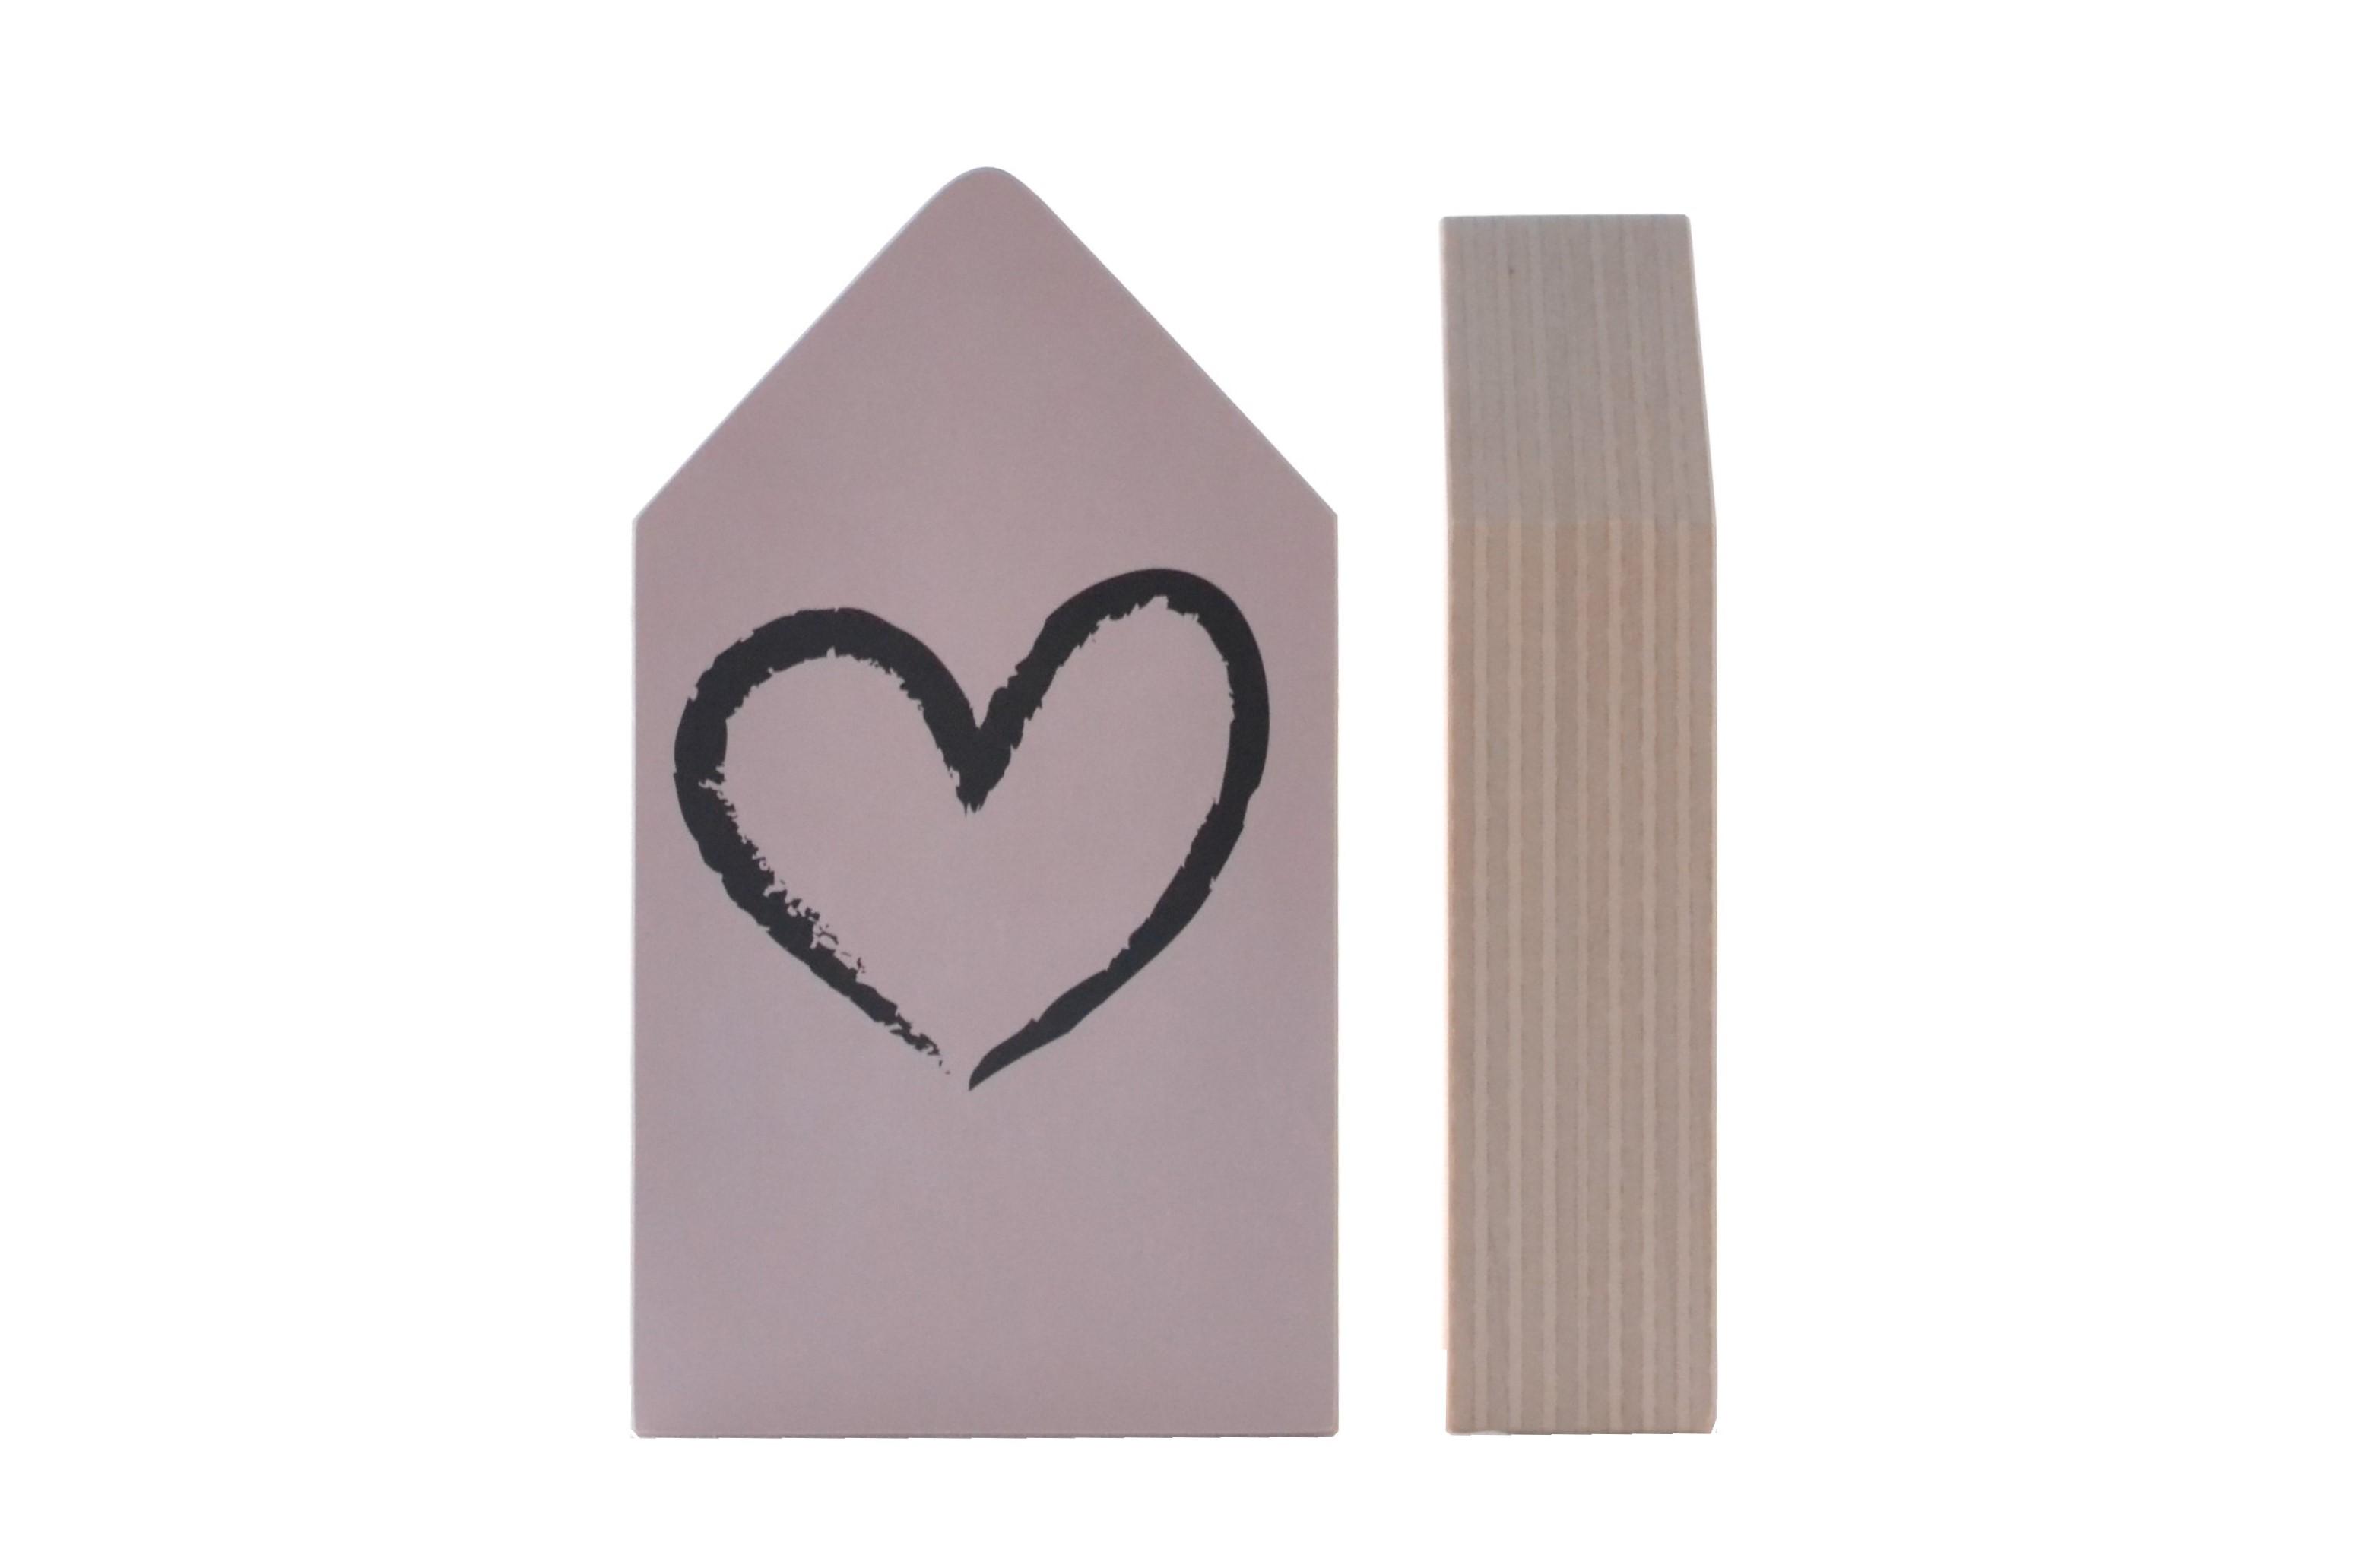 Houten huisje heart diepenmaat meubelen - Interieur houten huisje ...